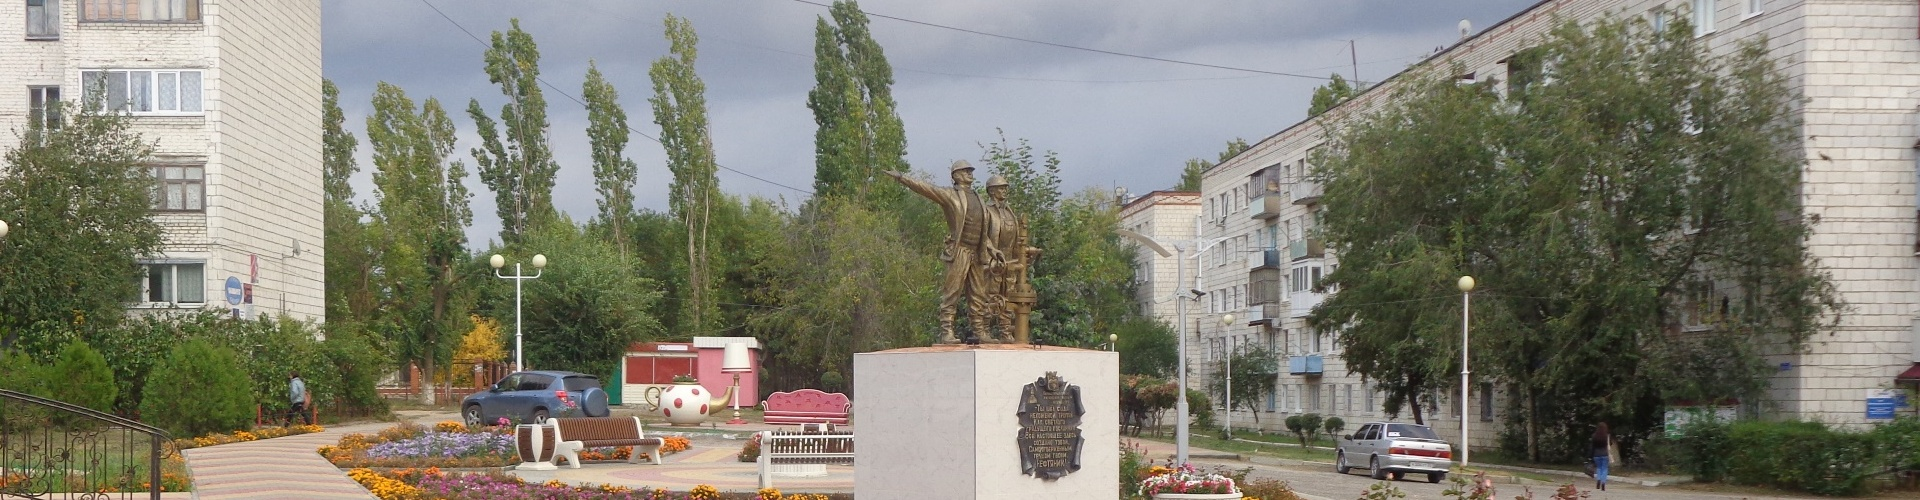 Памятник нефтяникам